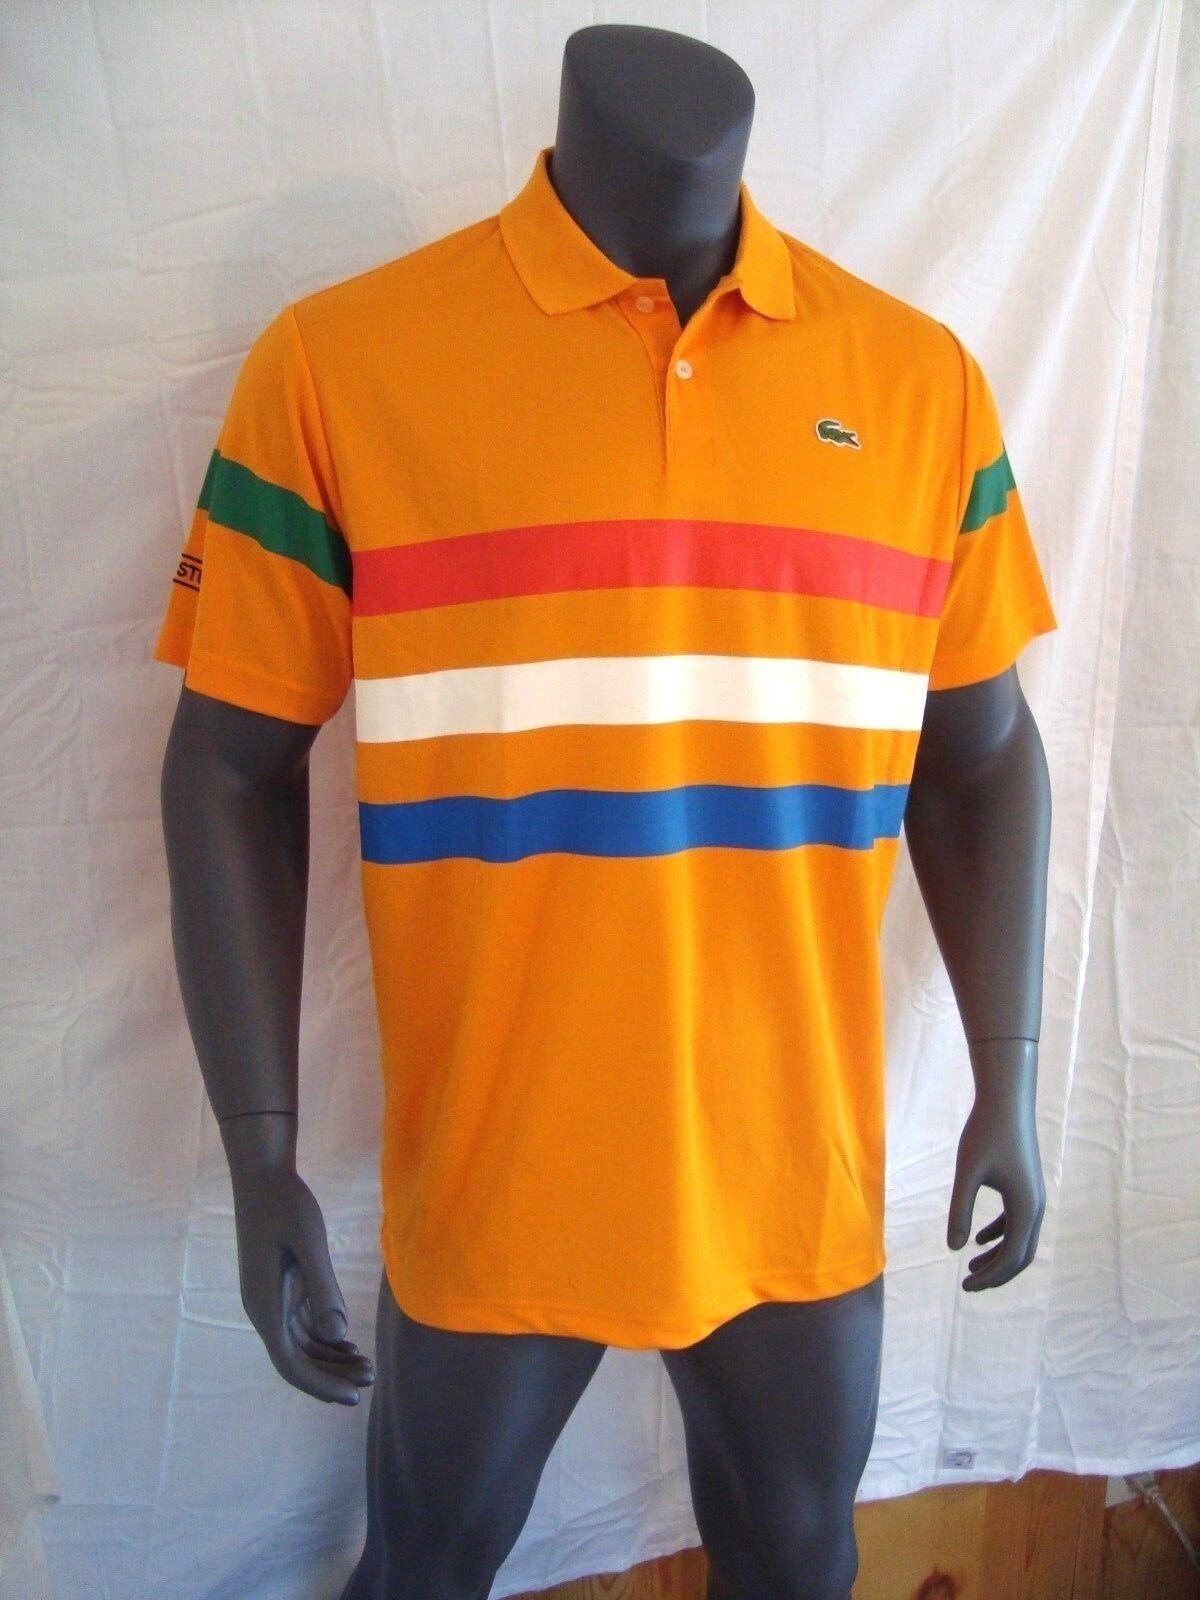 Lacoste SPORT orange w color Stripes Men's Polo Shirt NEW - XL - 2XL - 3XL - 4XL